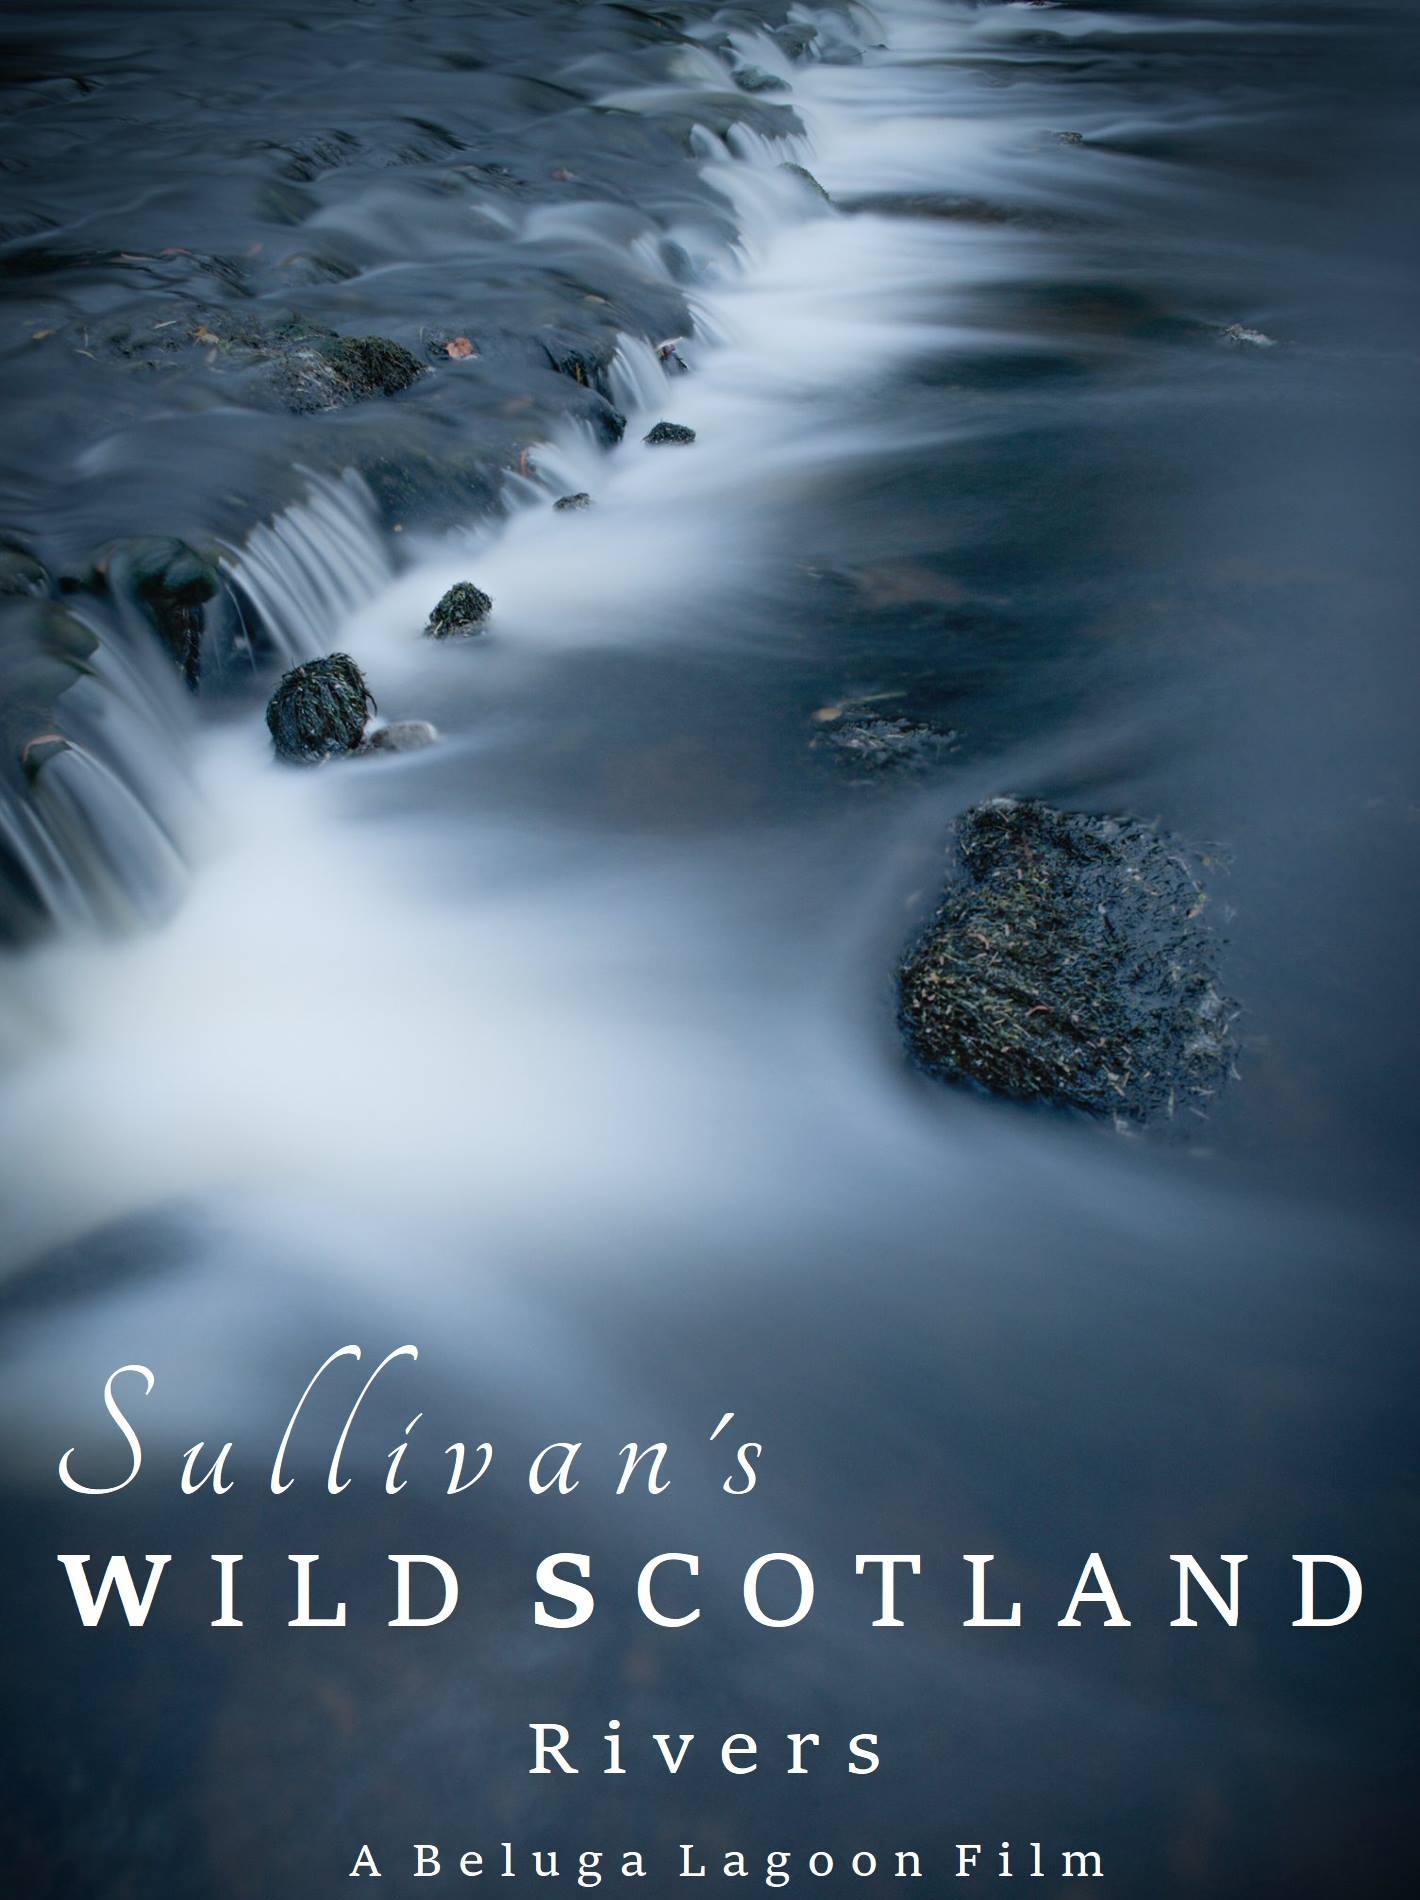 Sullivan's Wild Scotland Rivers